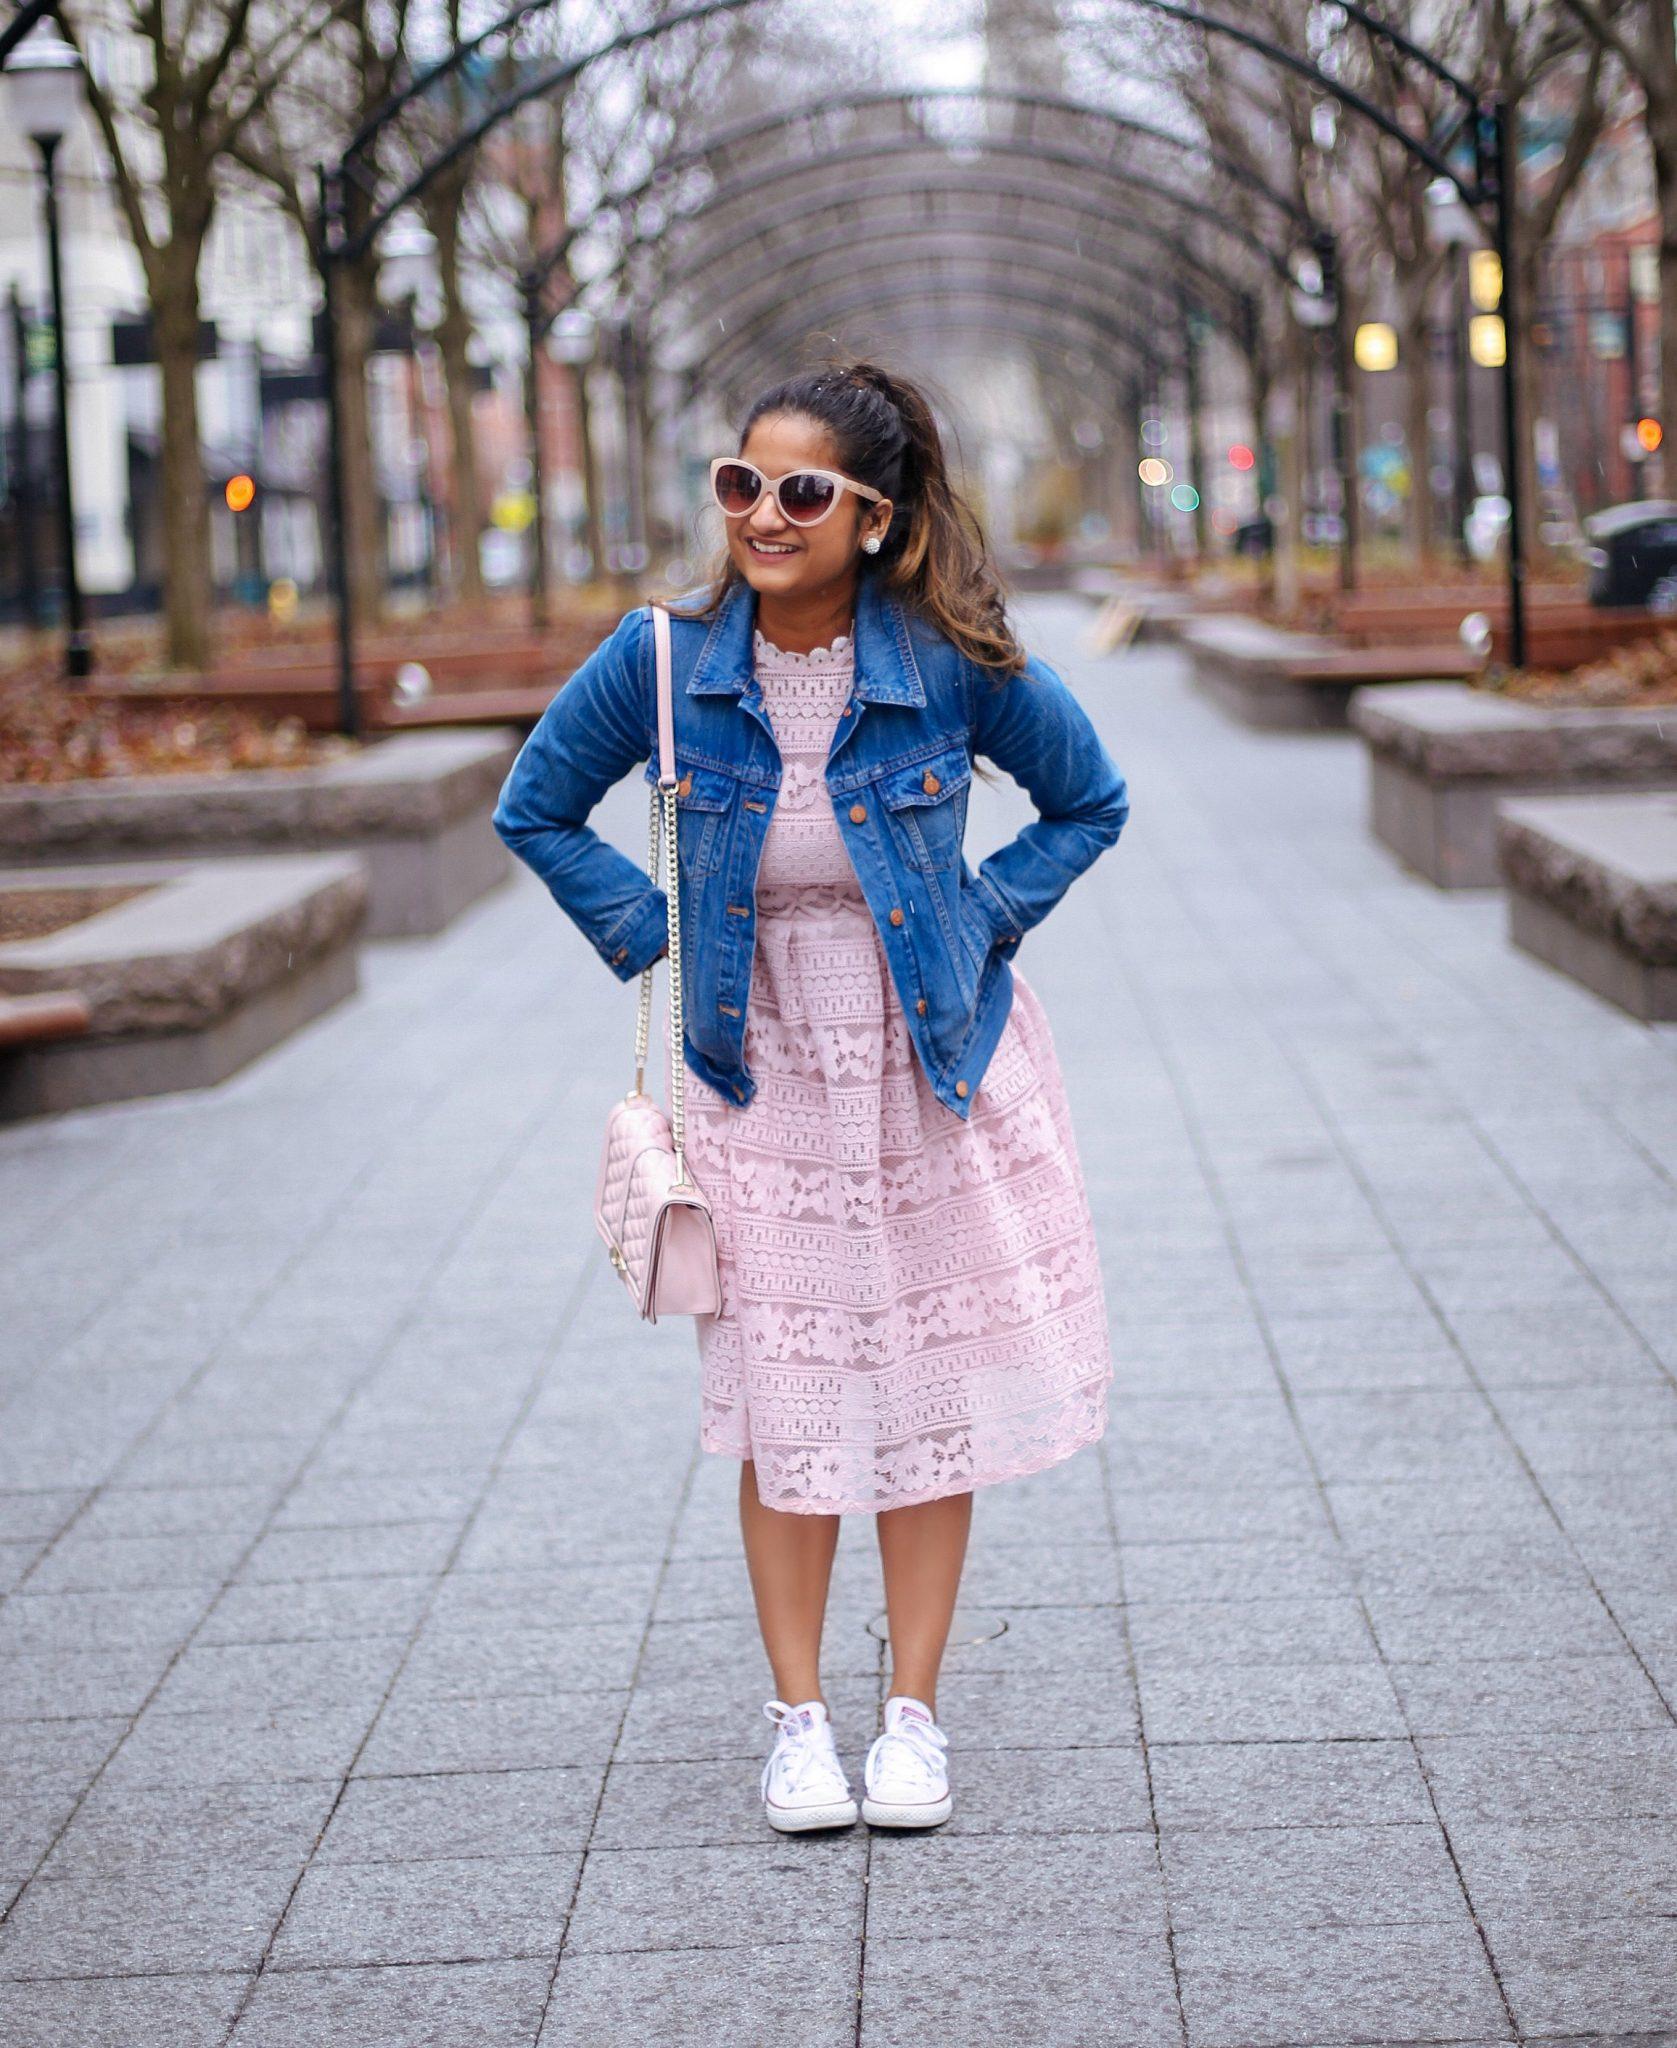 lifestyle blog dreaming loud wearing Crochet Openwork Lace High Waist Flare Dress